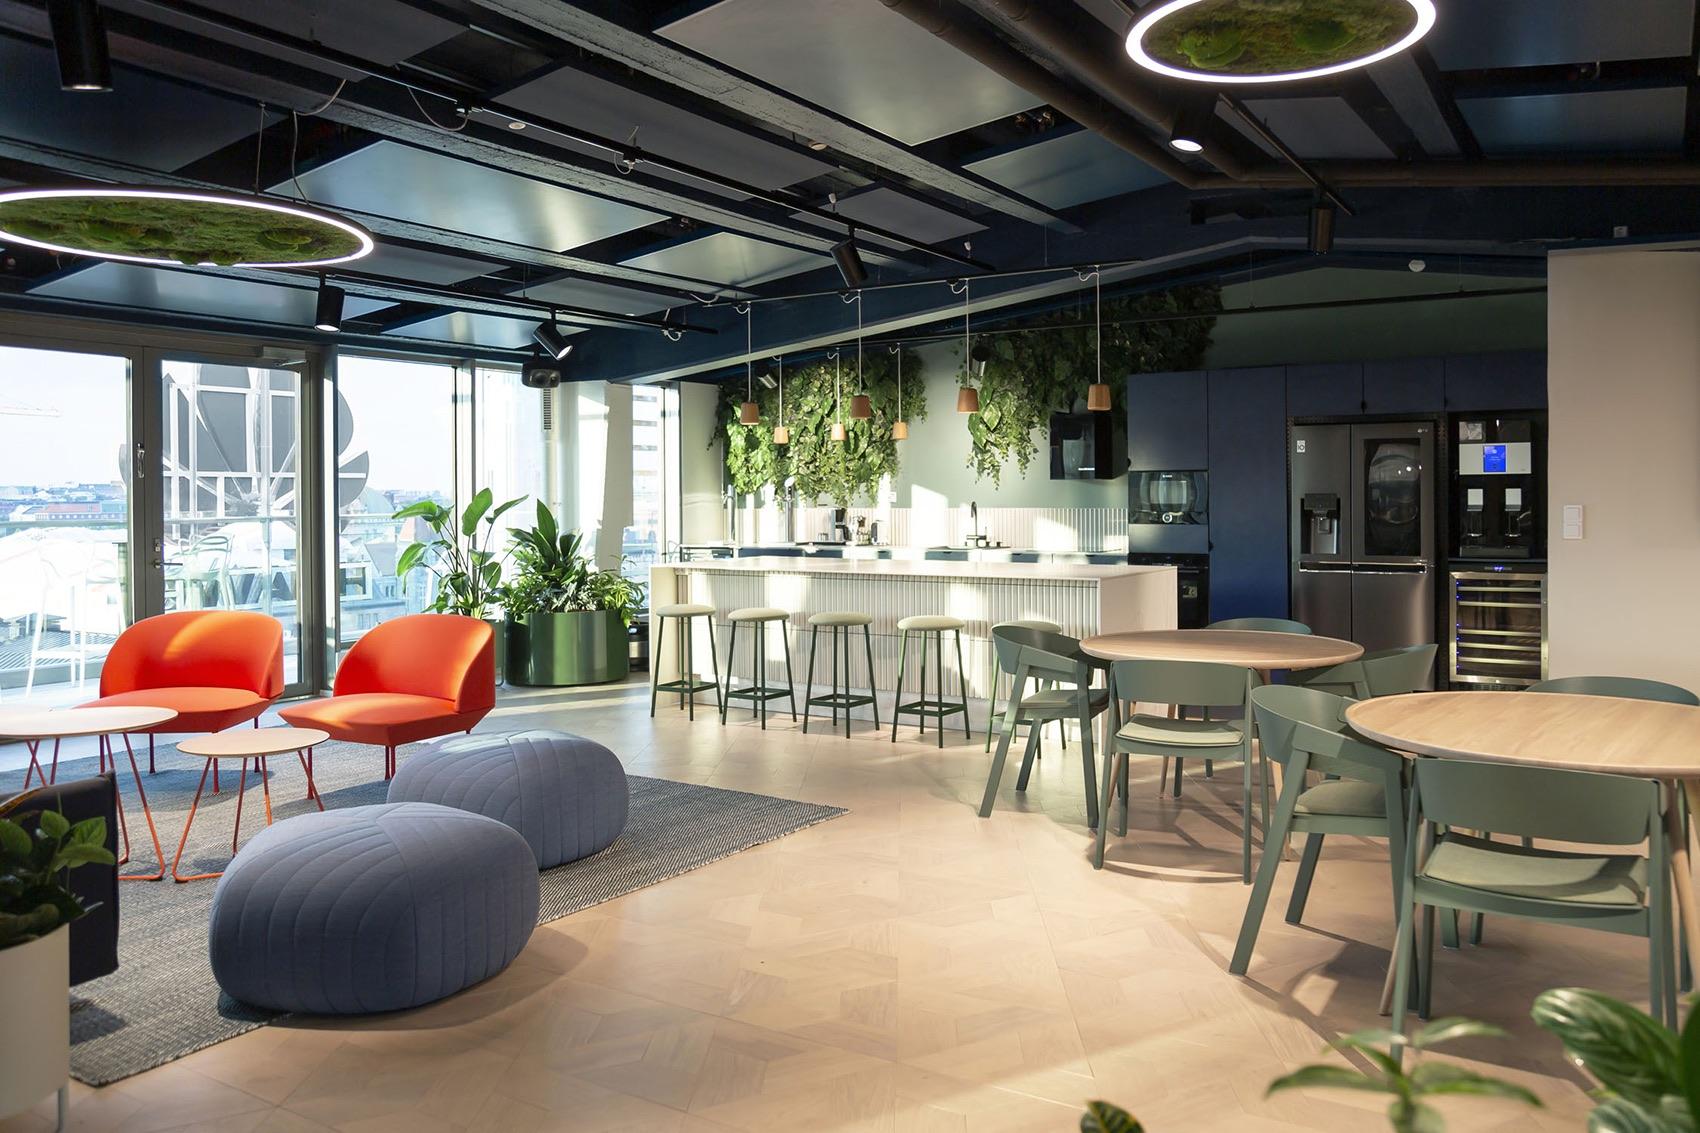 A Tour of Supermetrics' Cool New Helsinki Office